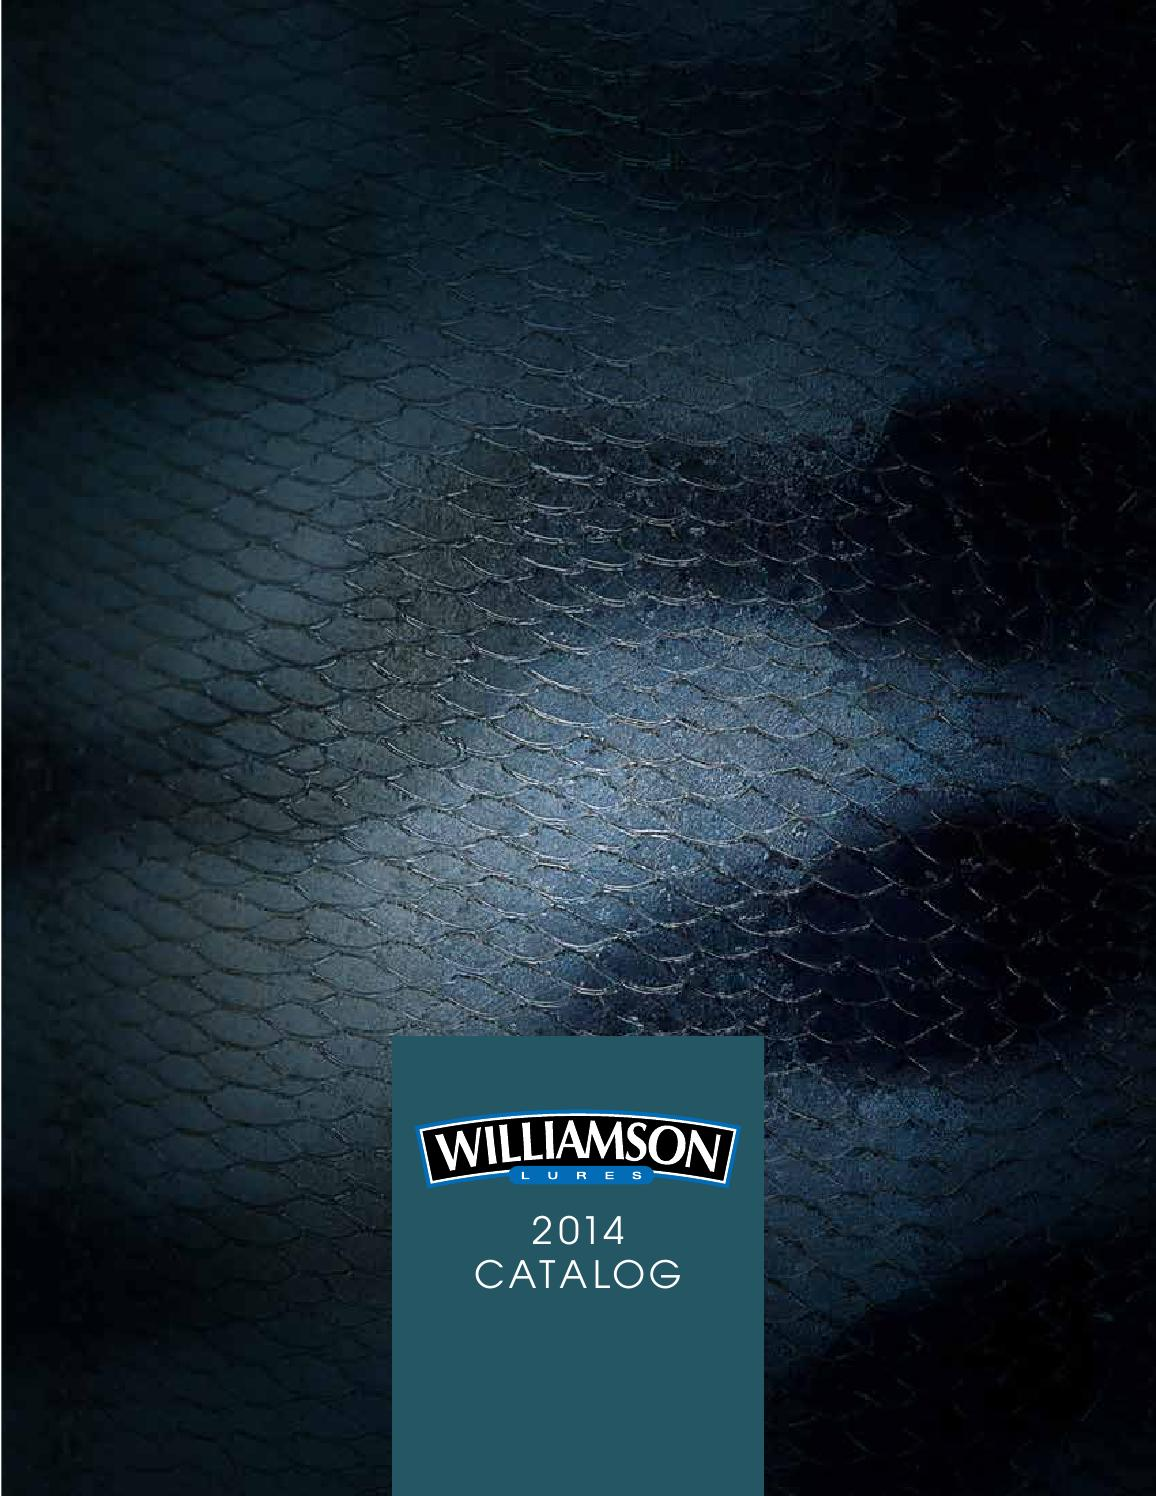 WILLIAMSON DINGO METAL JET BIG GAME LURE 75mm CHOOSE COLOUR